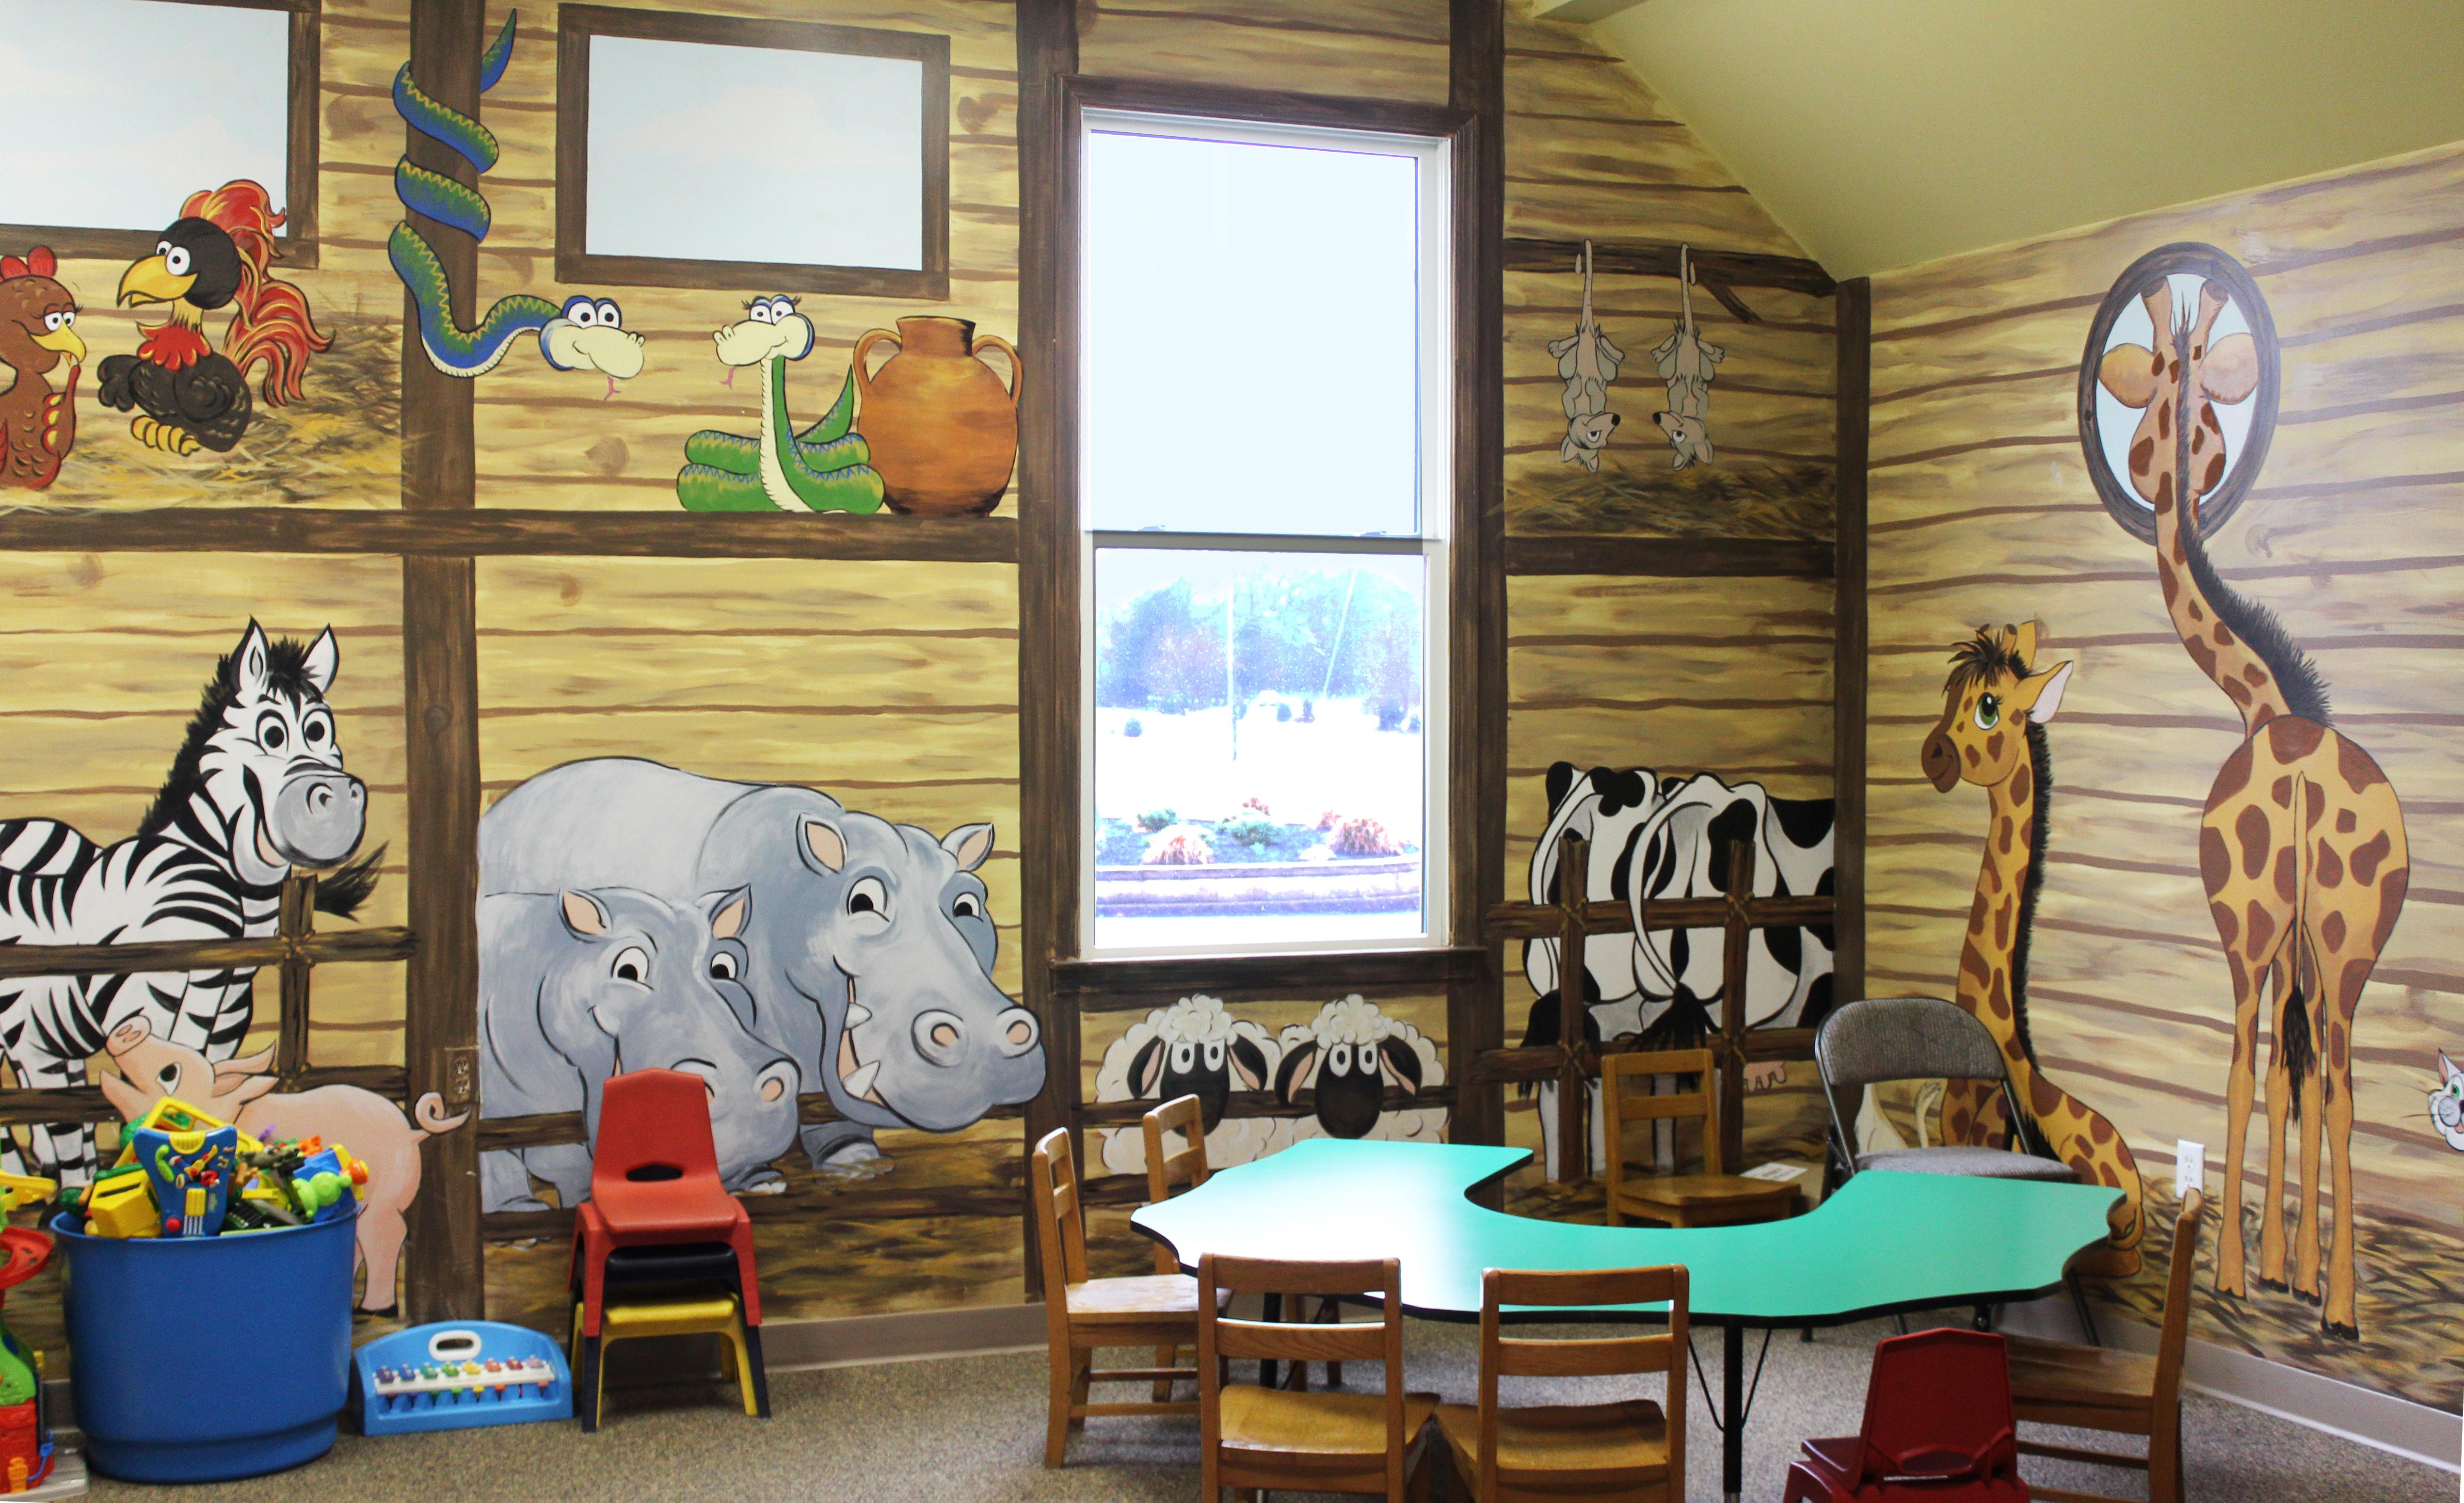 Noahs Ark Room